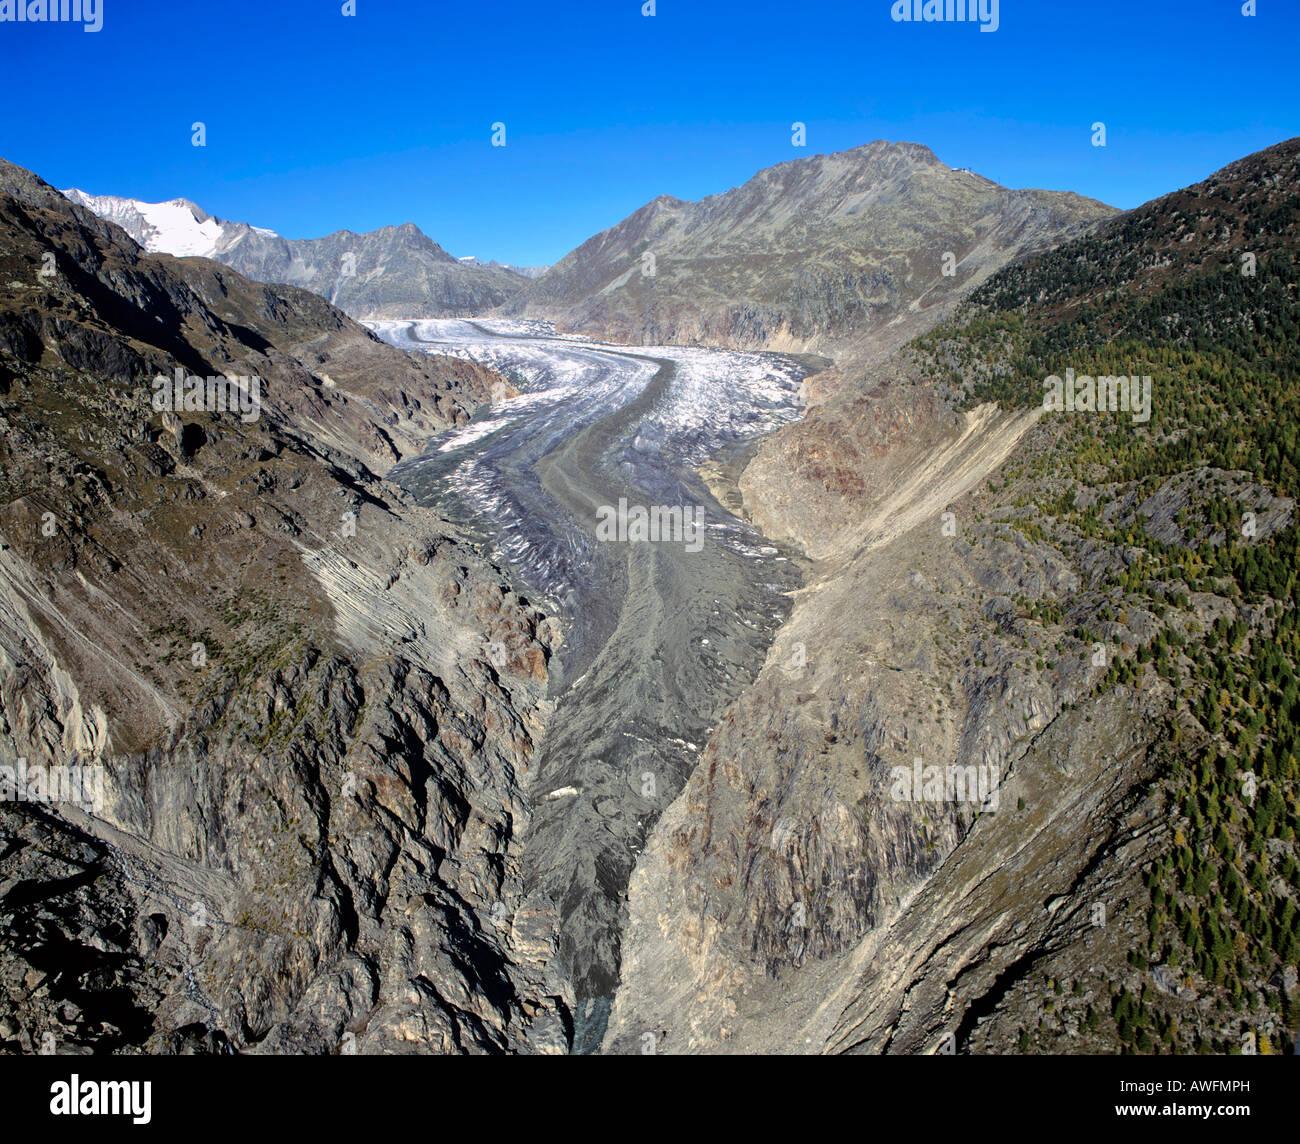 Aletsch Glacier, tip of the glacier tongue, Bernese Alps, Valais, Switzerland, Europe - Stock Image